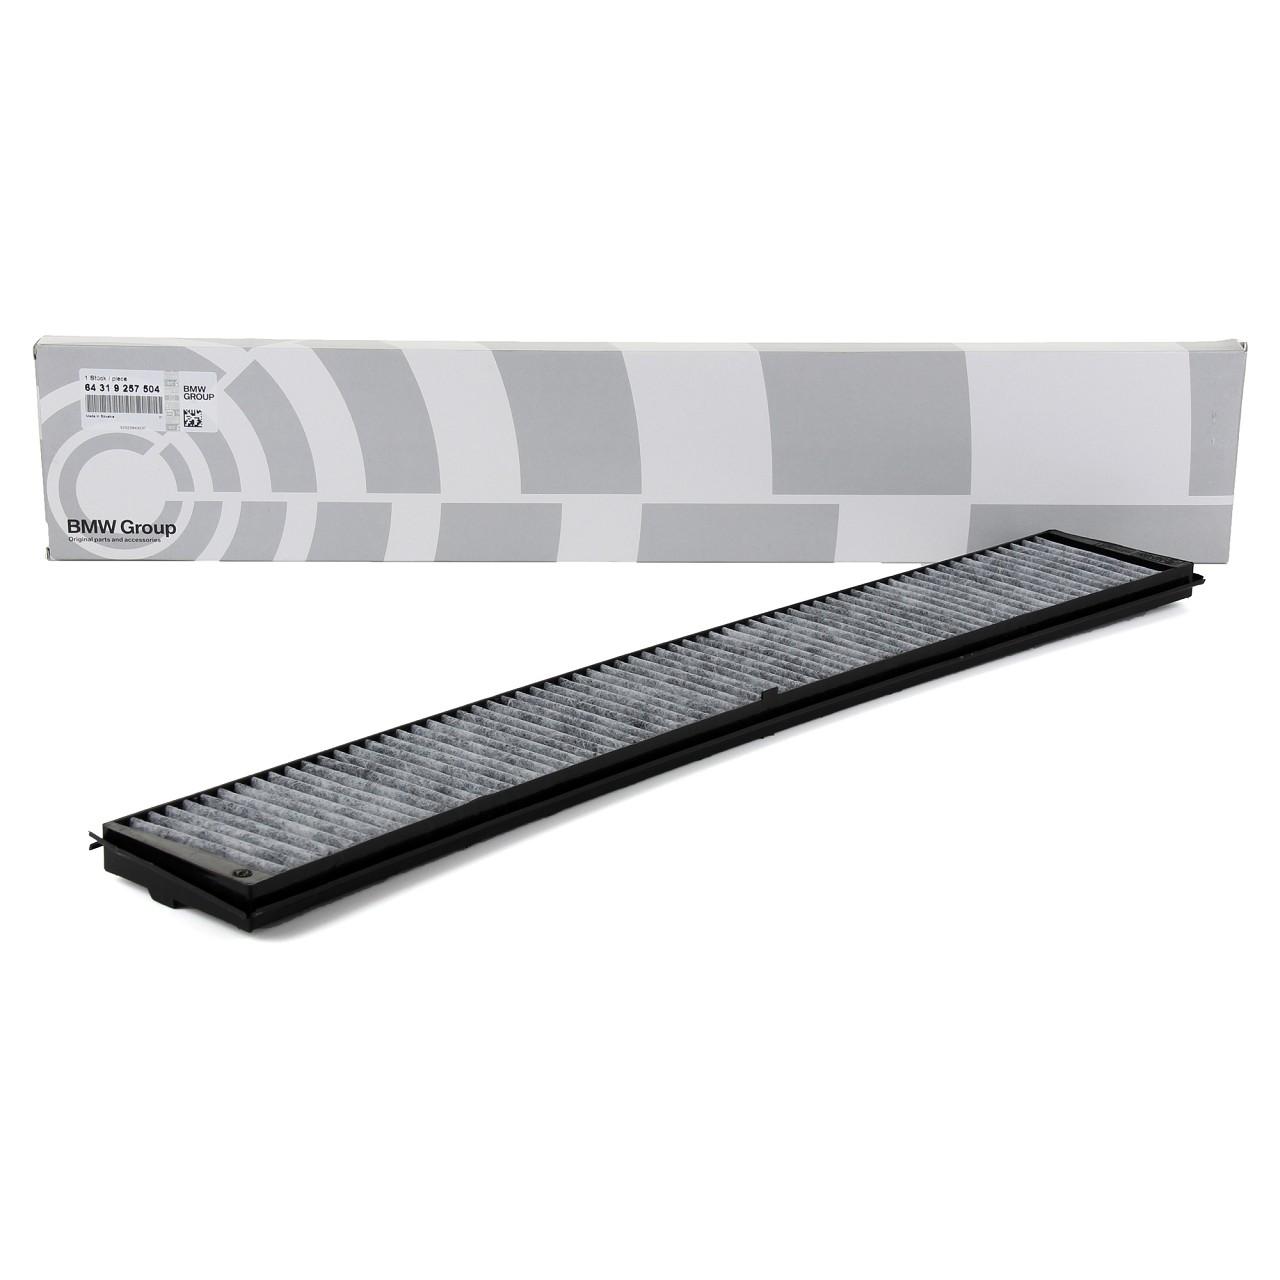 ORIGINAL BMW Innenraumfilter Aktivkohlefilter 64319257504 für 3er E46 X3 E83